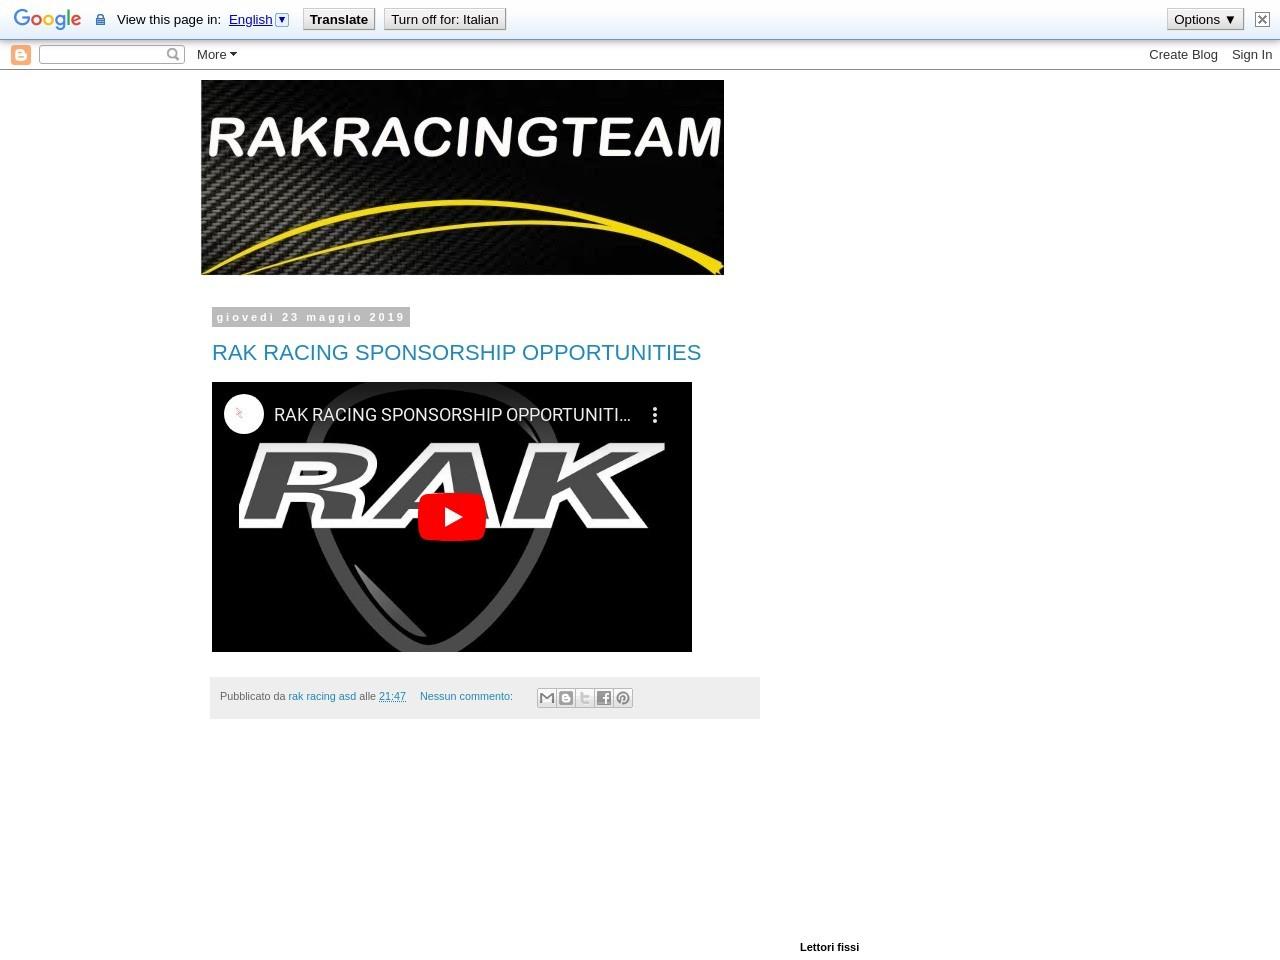 rak-racing-team